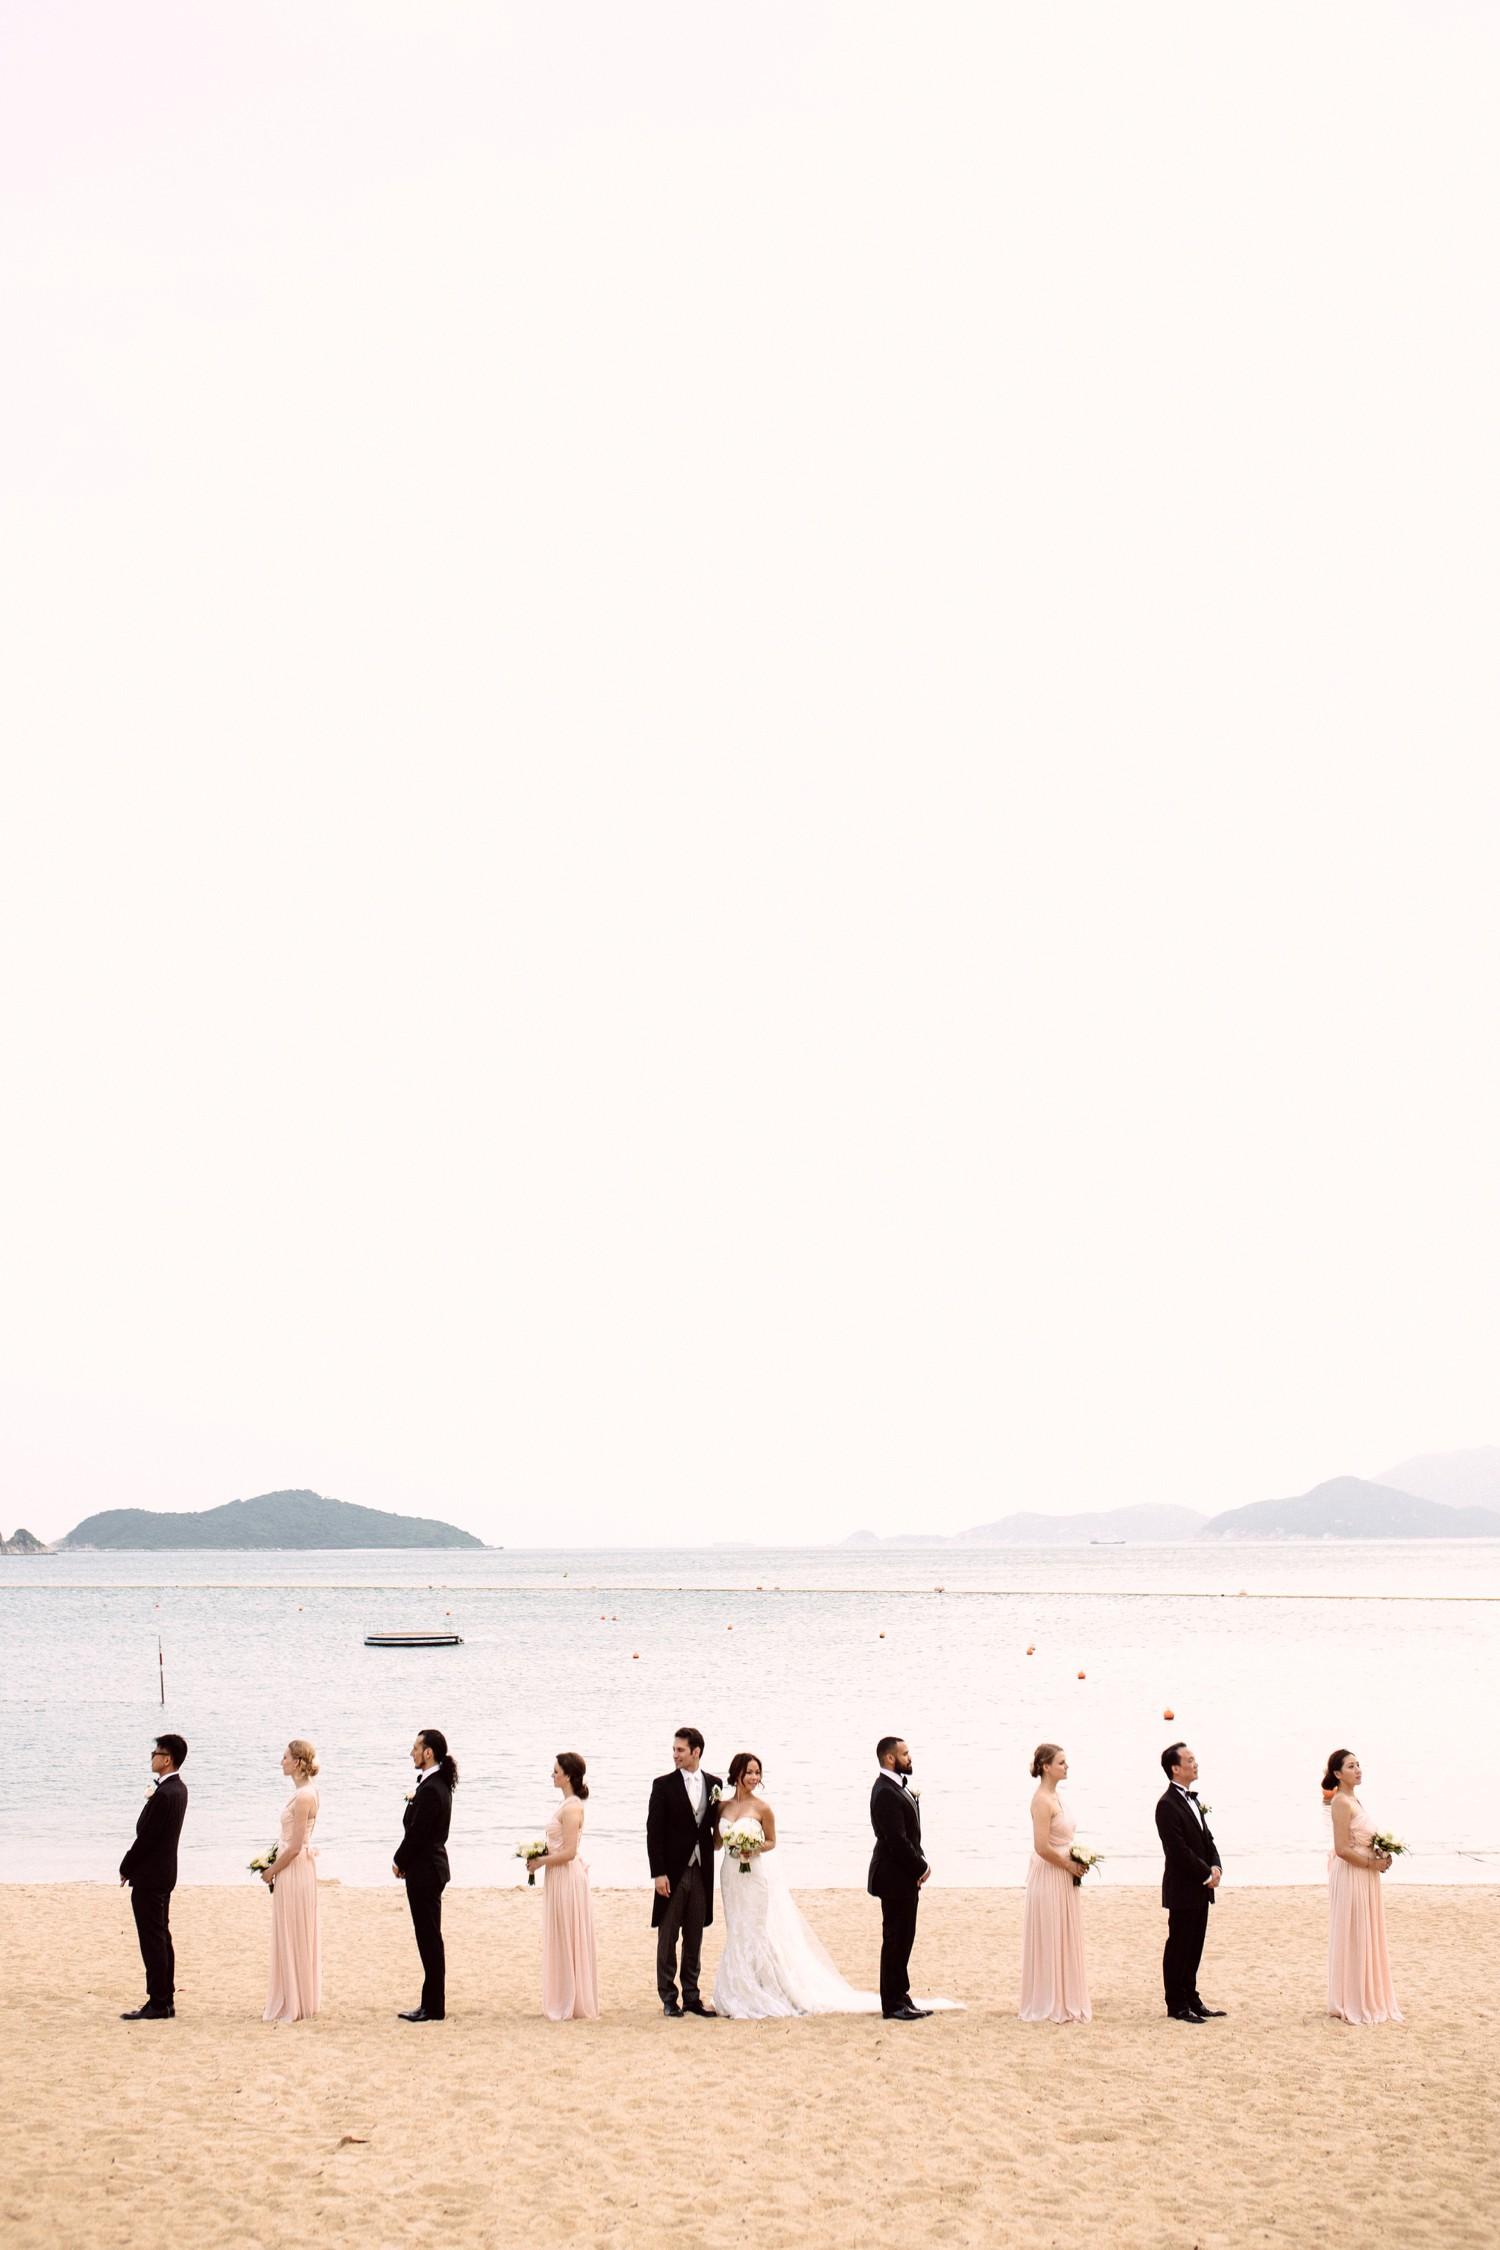 SUEGRAPHY | Destination Wedding Photographer Hong Kong | Denny and Diana 0457.JPG